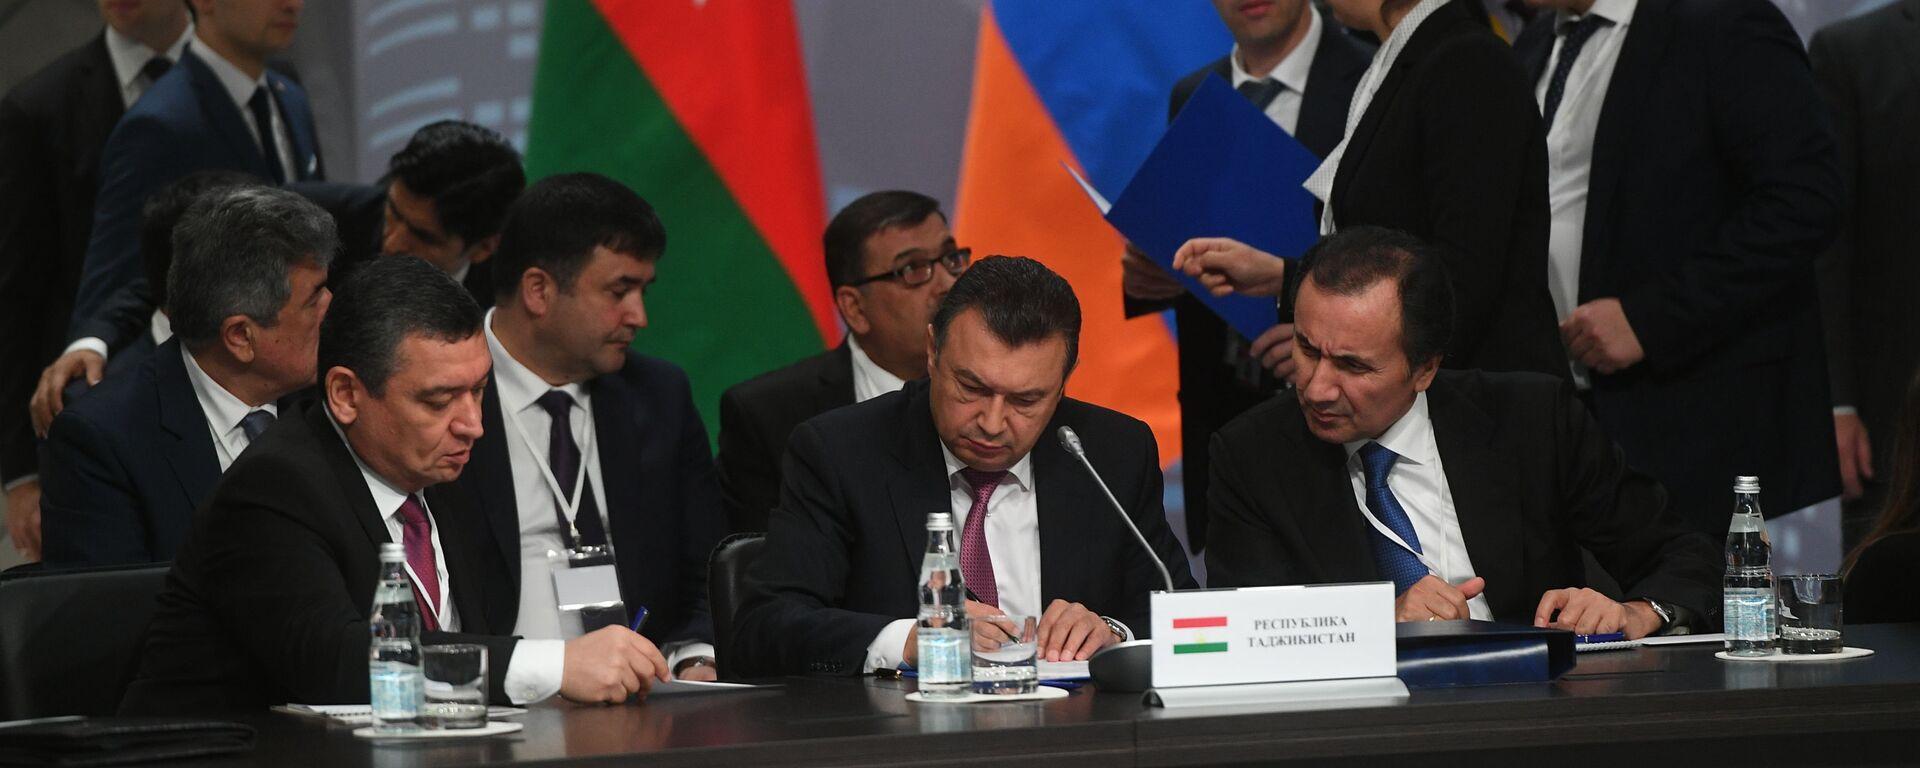 Премьер-министр Таджикистана Кохир Расулзода на заседании совета стран СНГ - Sputnik Таджикистан, 1920, 25.10.2019